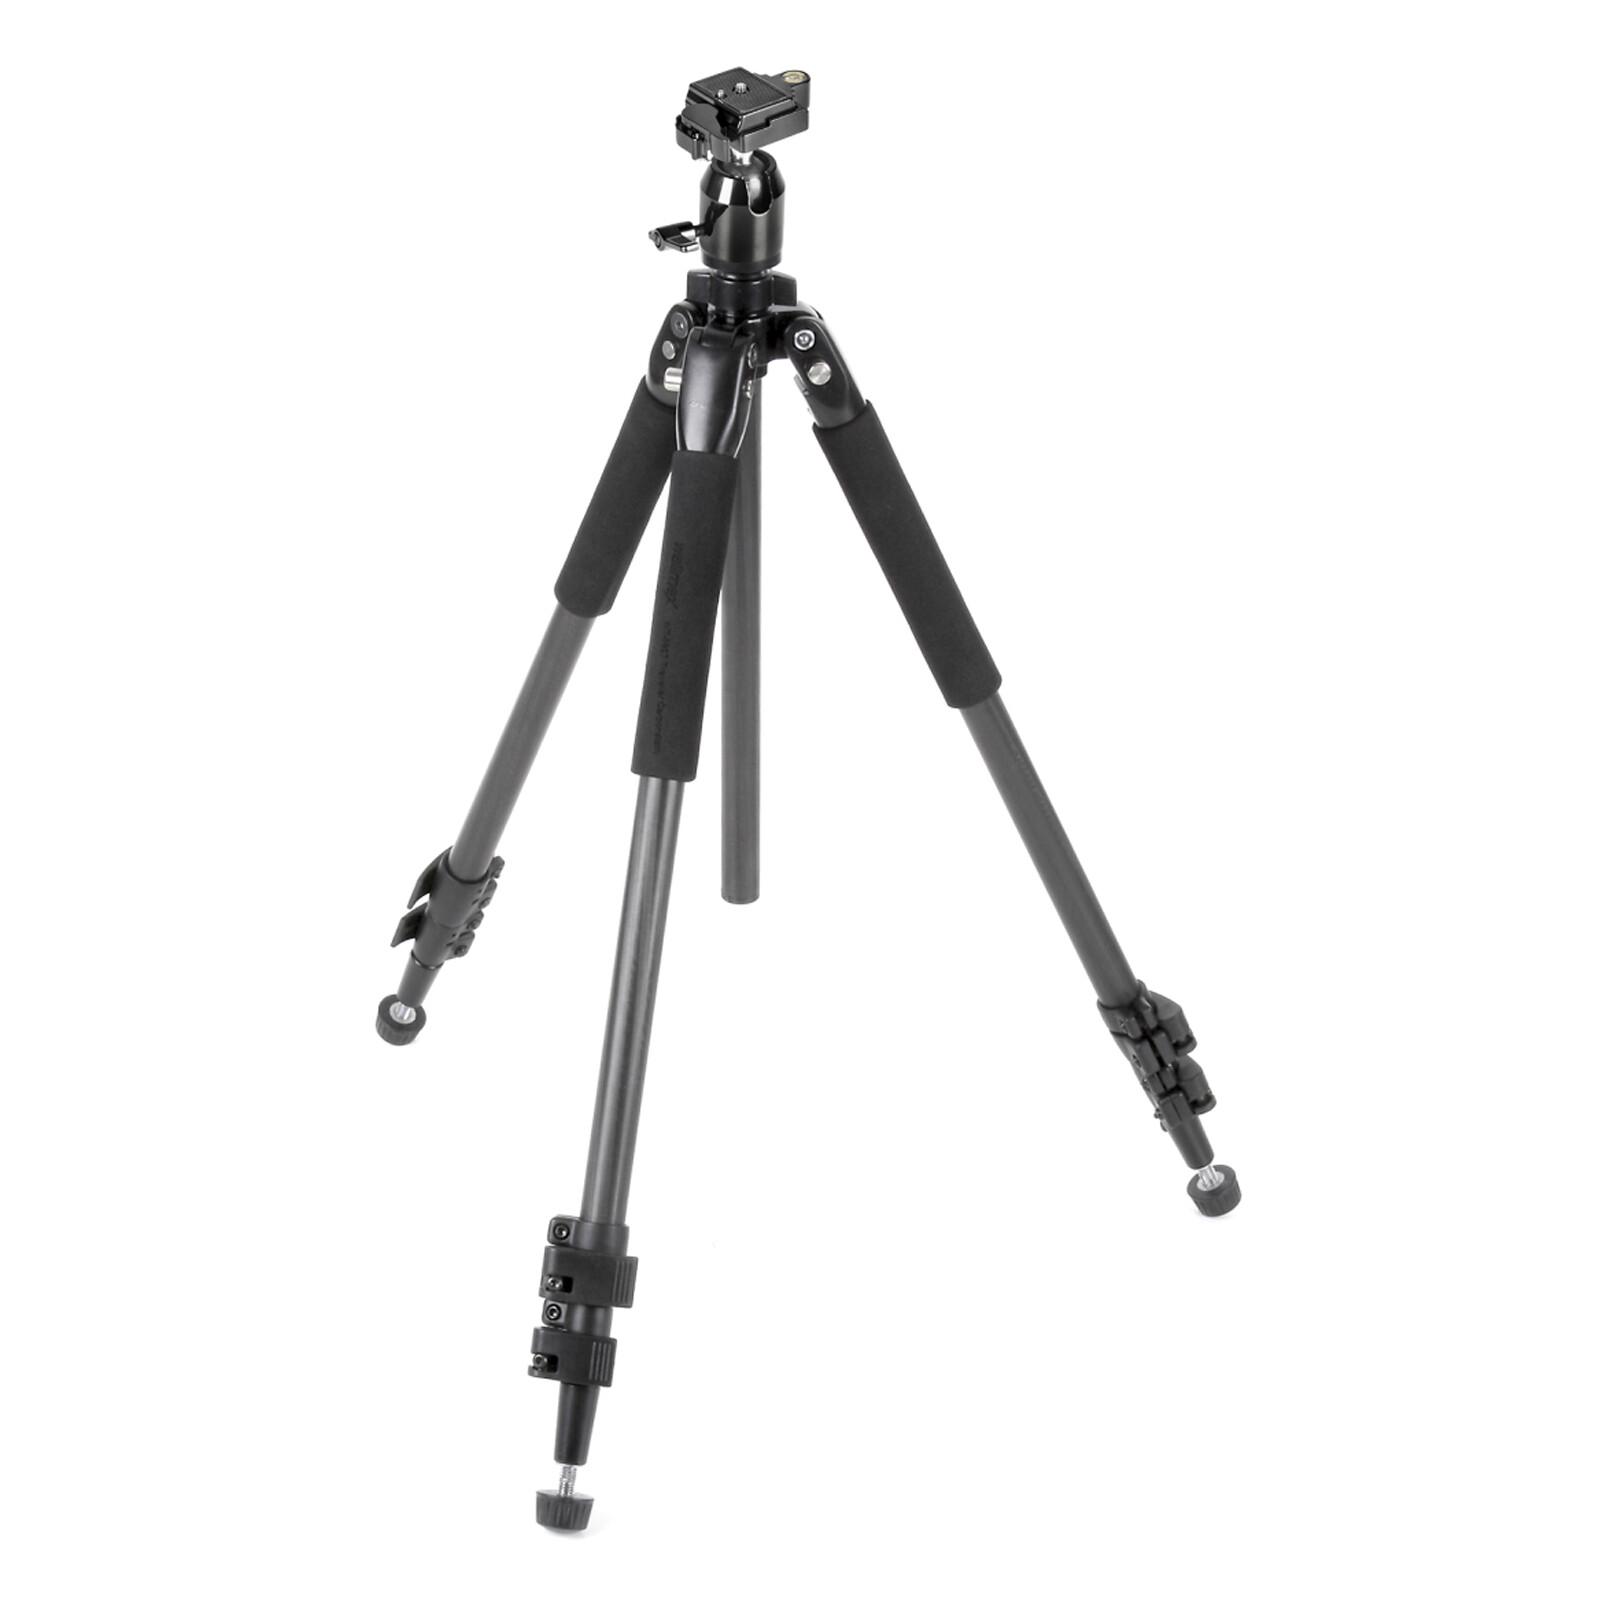 Walimex pro WT-890T Carbon + Kugelkopf FT-002H